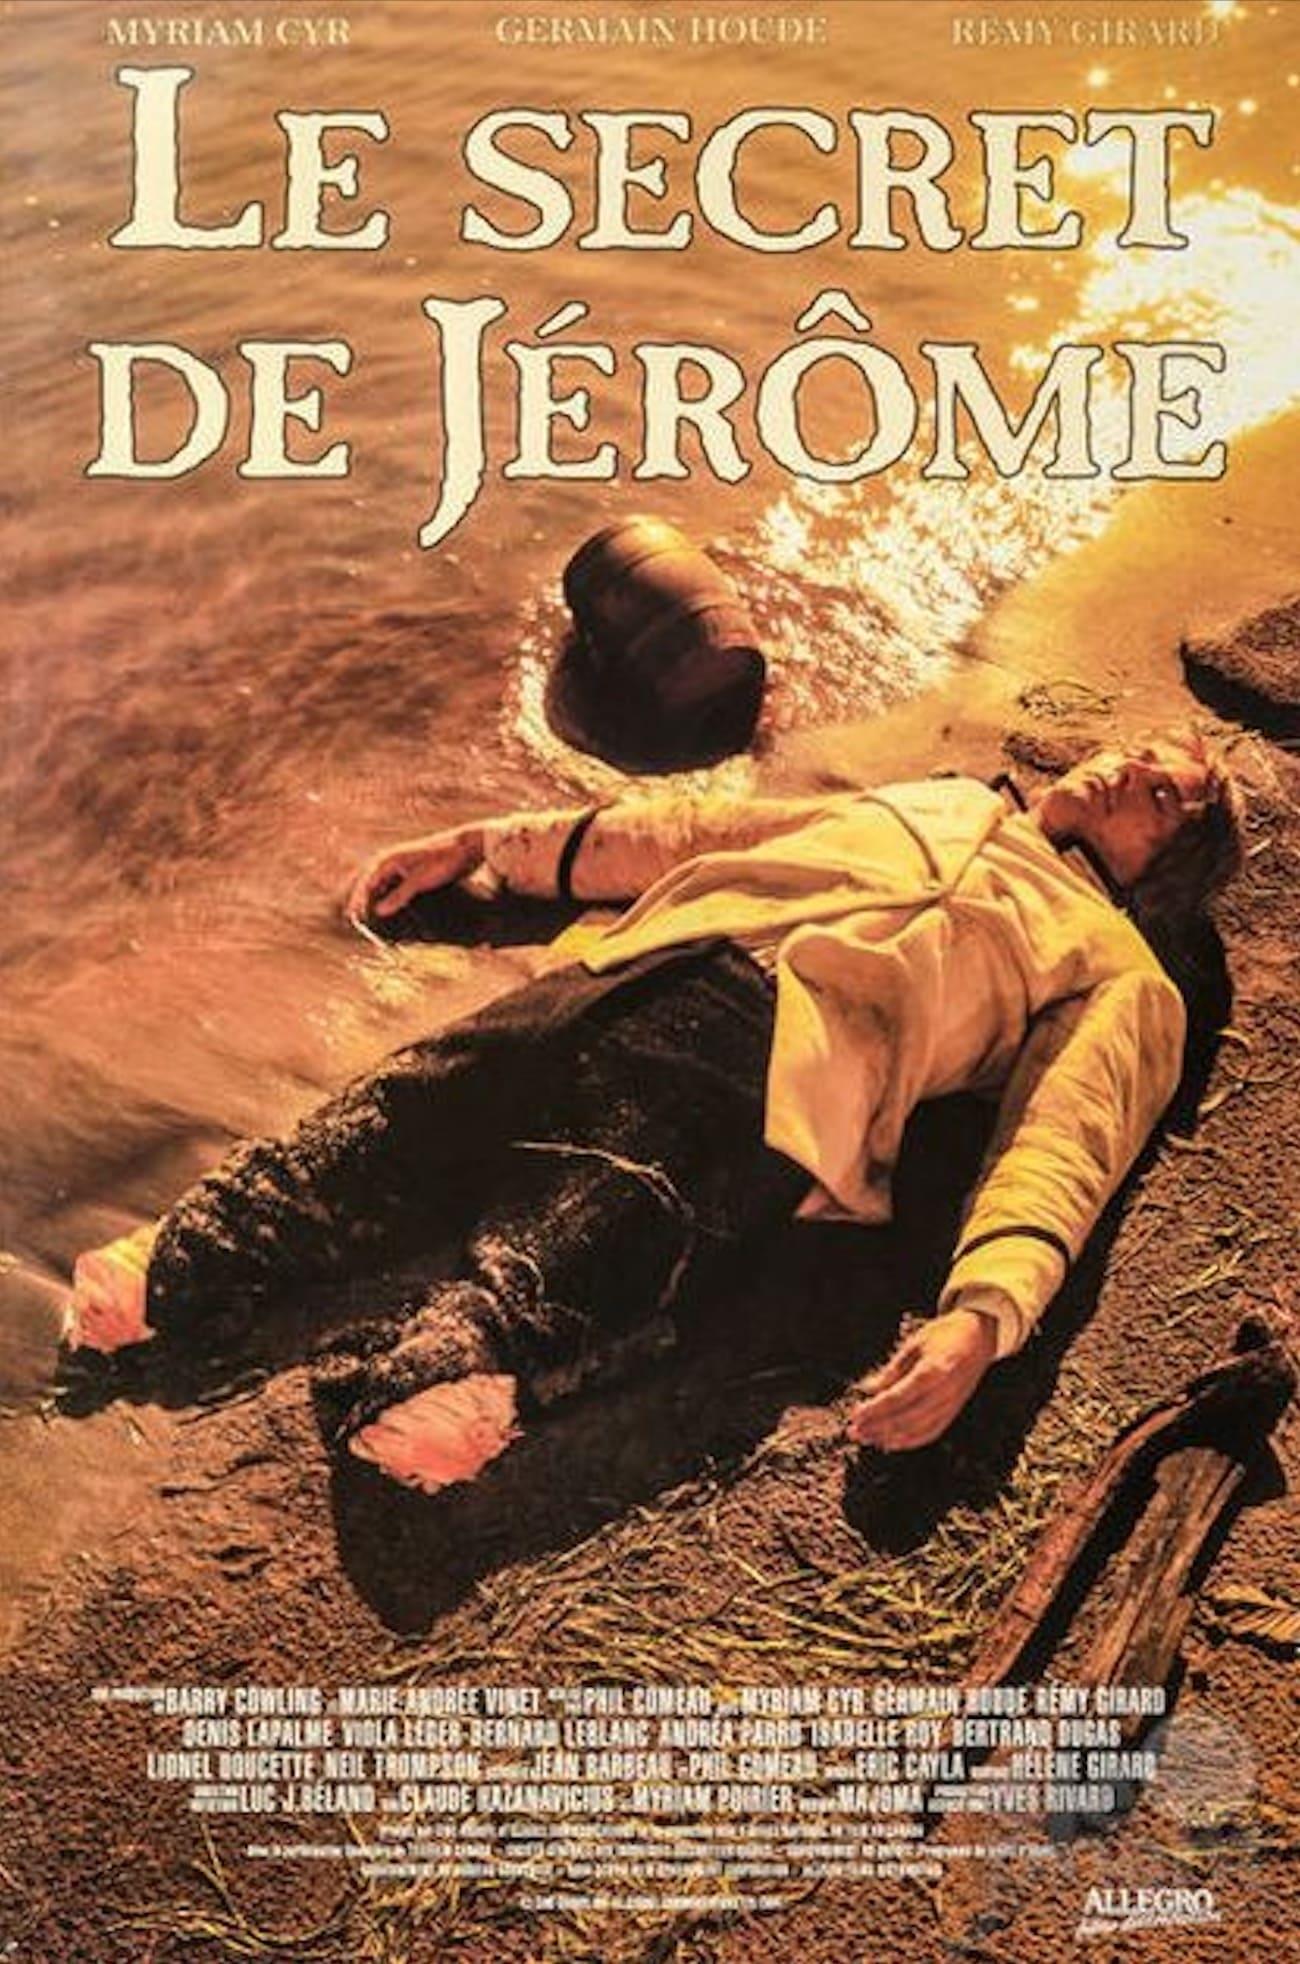 Jerome's Secret